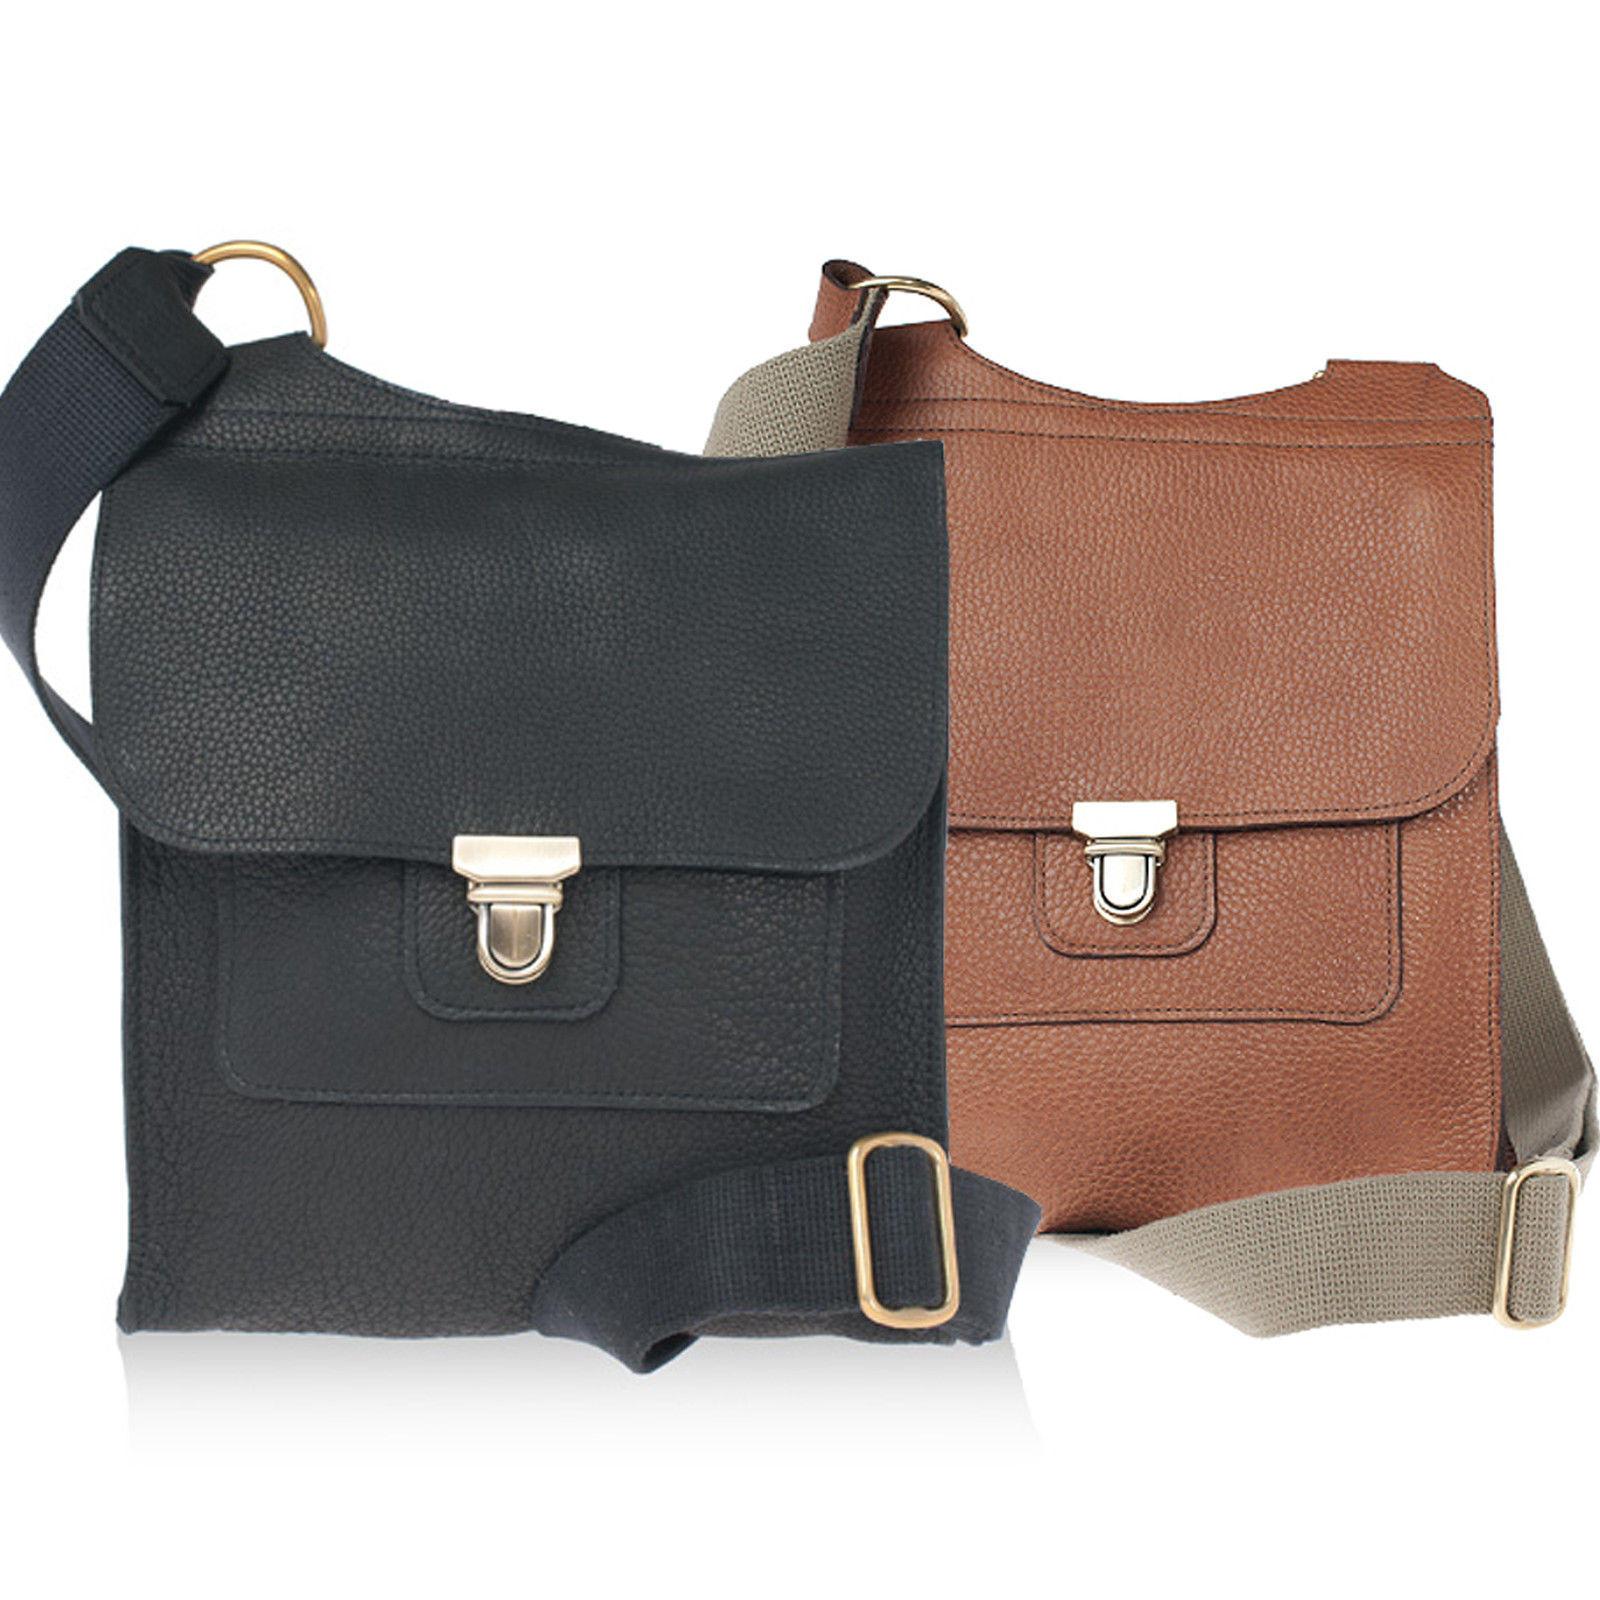 4bea6463da Outlet - ISAMBARD Clifton Messenger   Cross Body Bag In Soft Tumbled ...